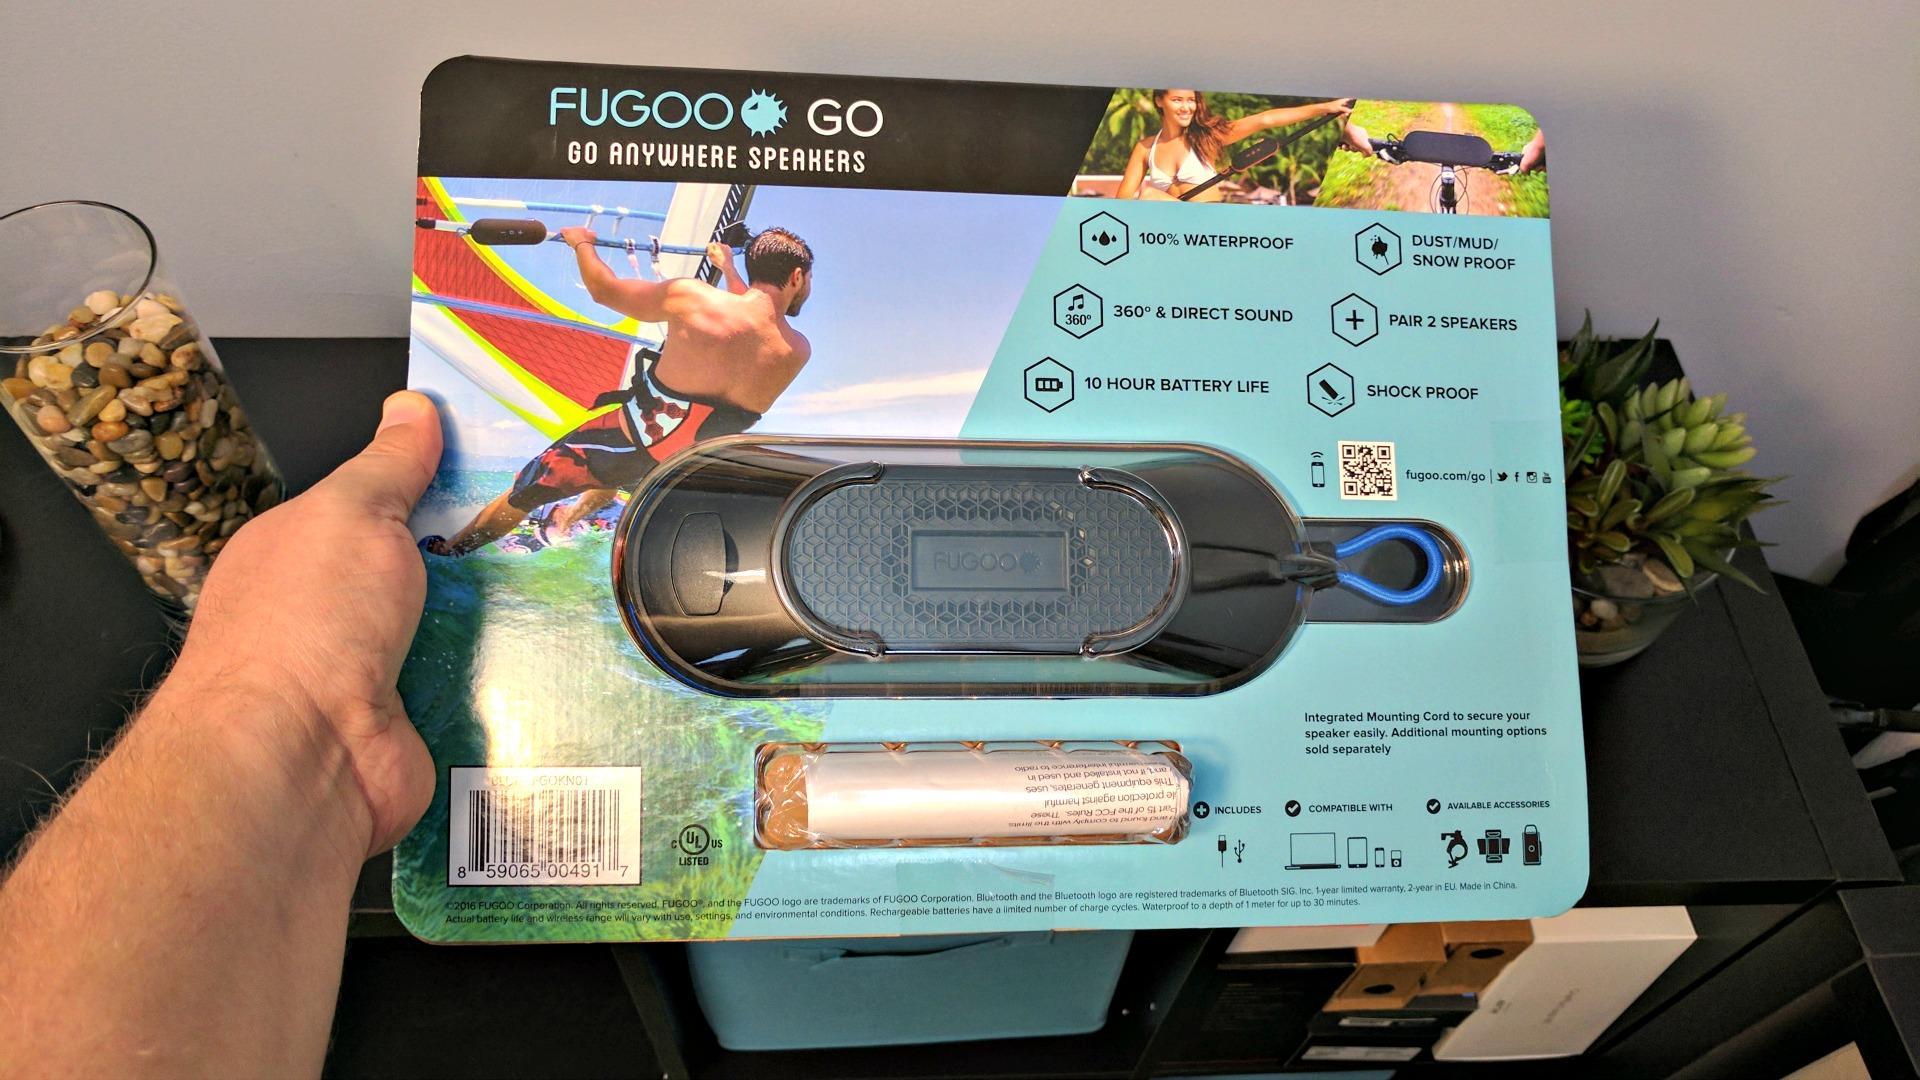 Fugoo Go Review A Portable Go Anywhere Speaker